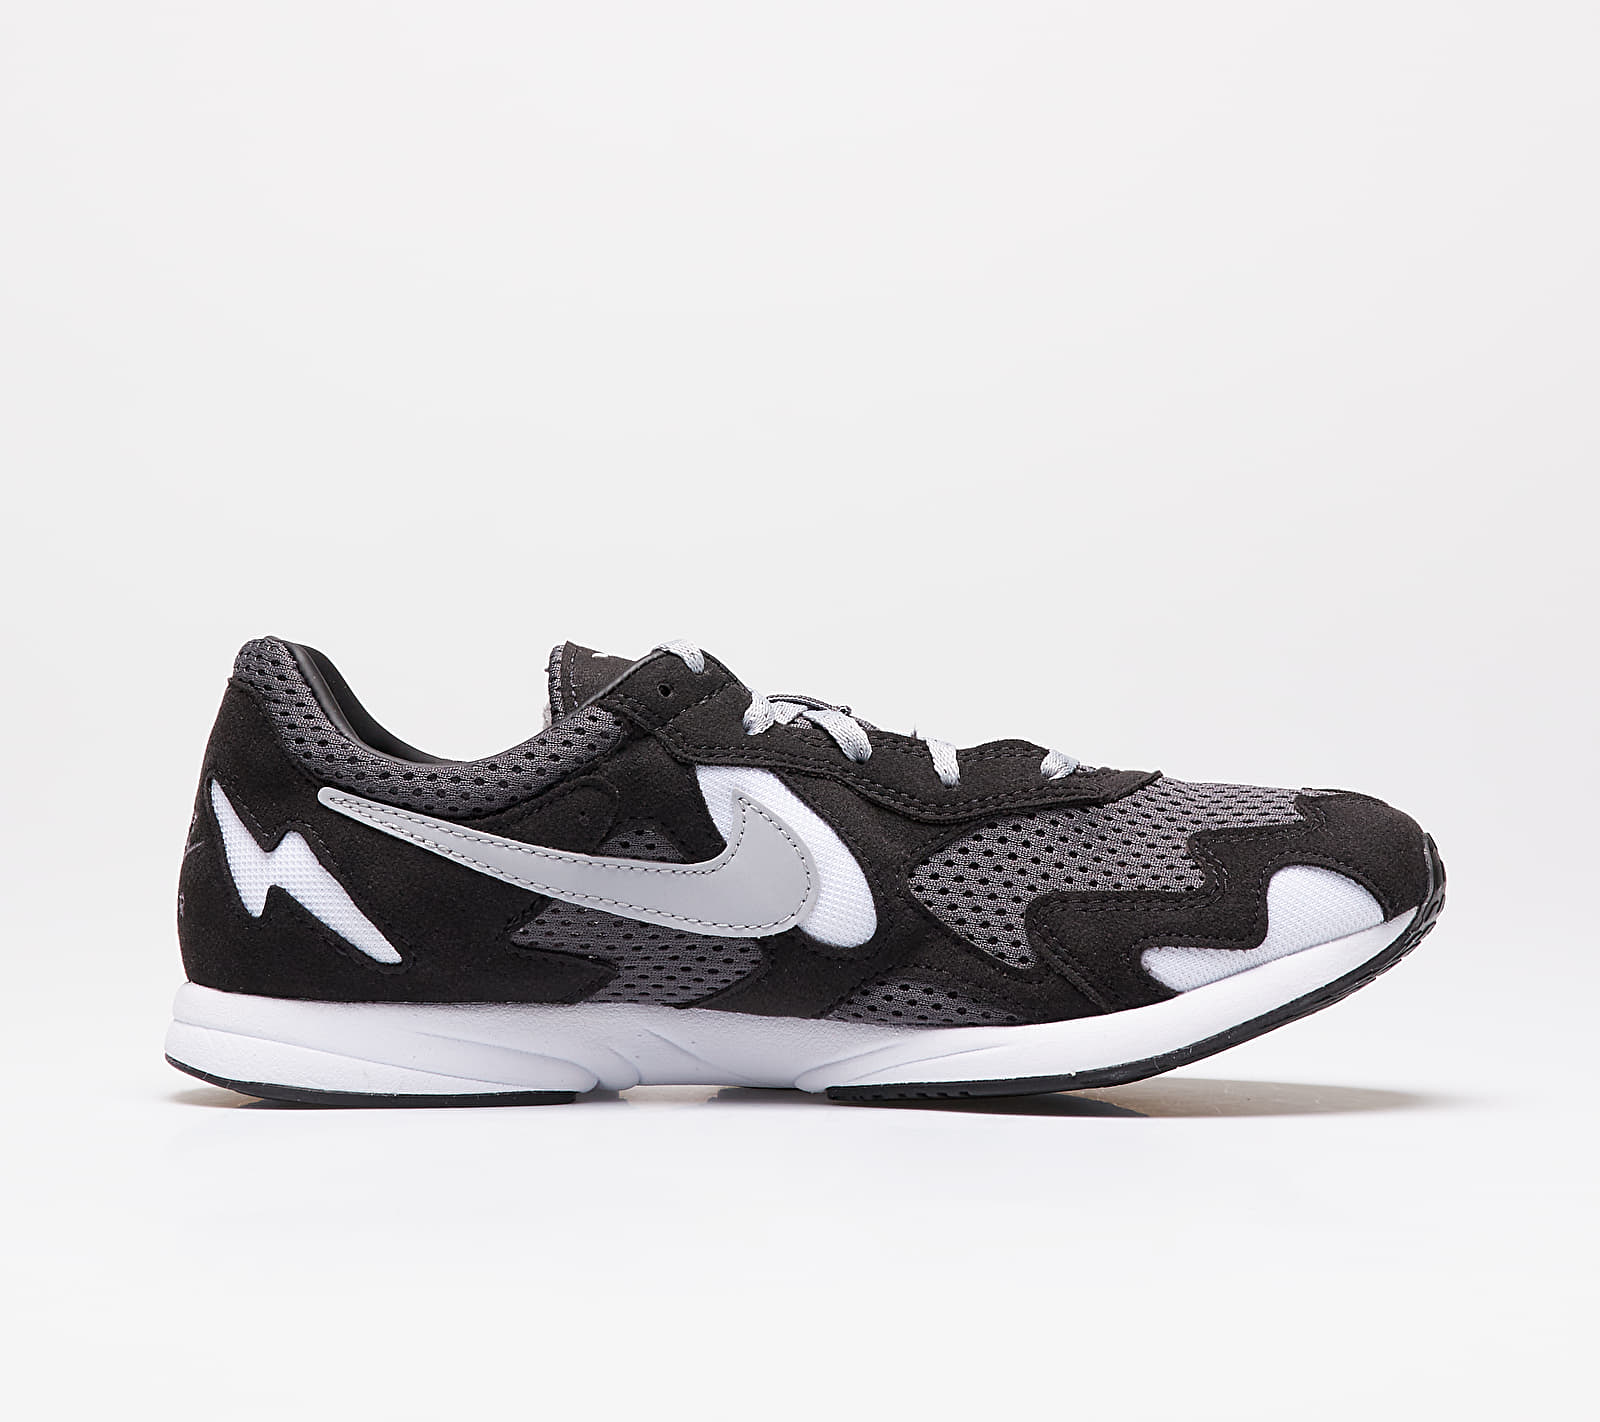 Nike Air Streak Lite Black/ Wolf Grey-Dark Grey-White